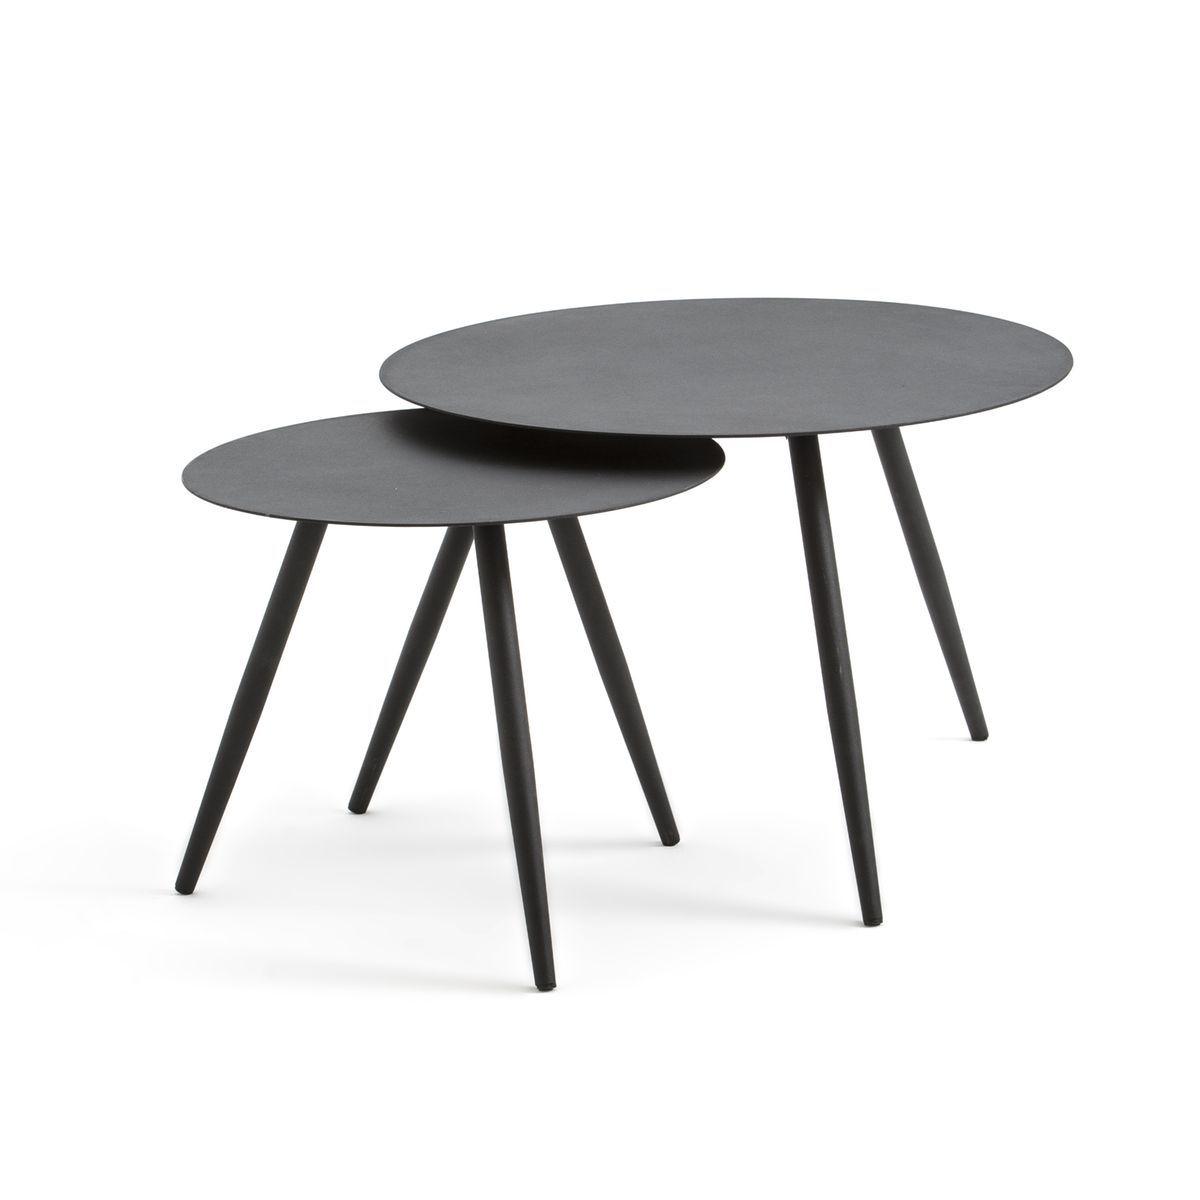 2 Tables Basses De Jardin Ibiza Metal Table Basse Table Basse